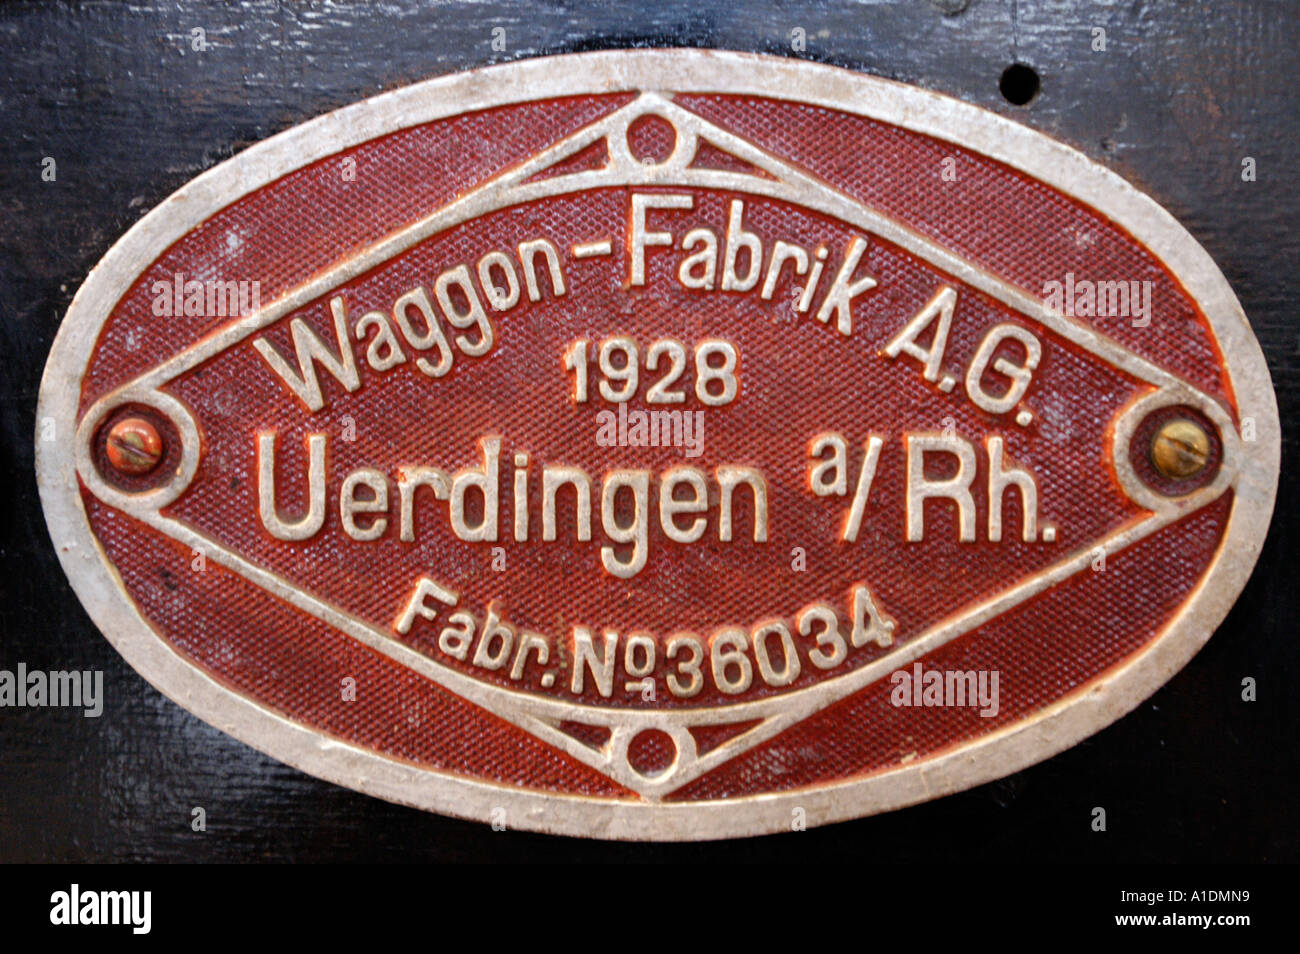 Heritage sign of Waggon Fabrik AG 1928 Uerdingen am Rhein - Stock Image